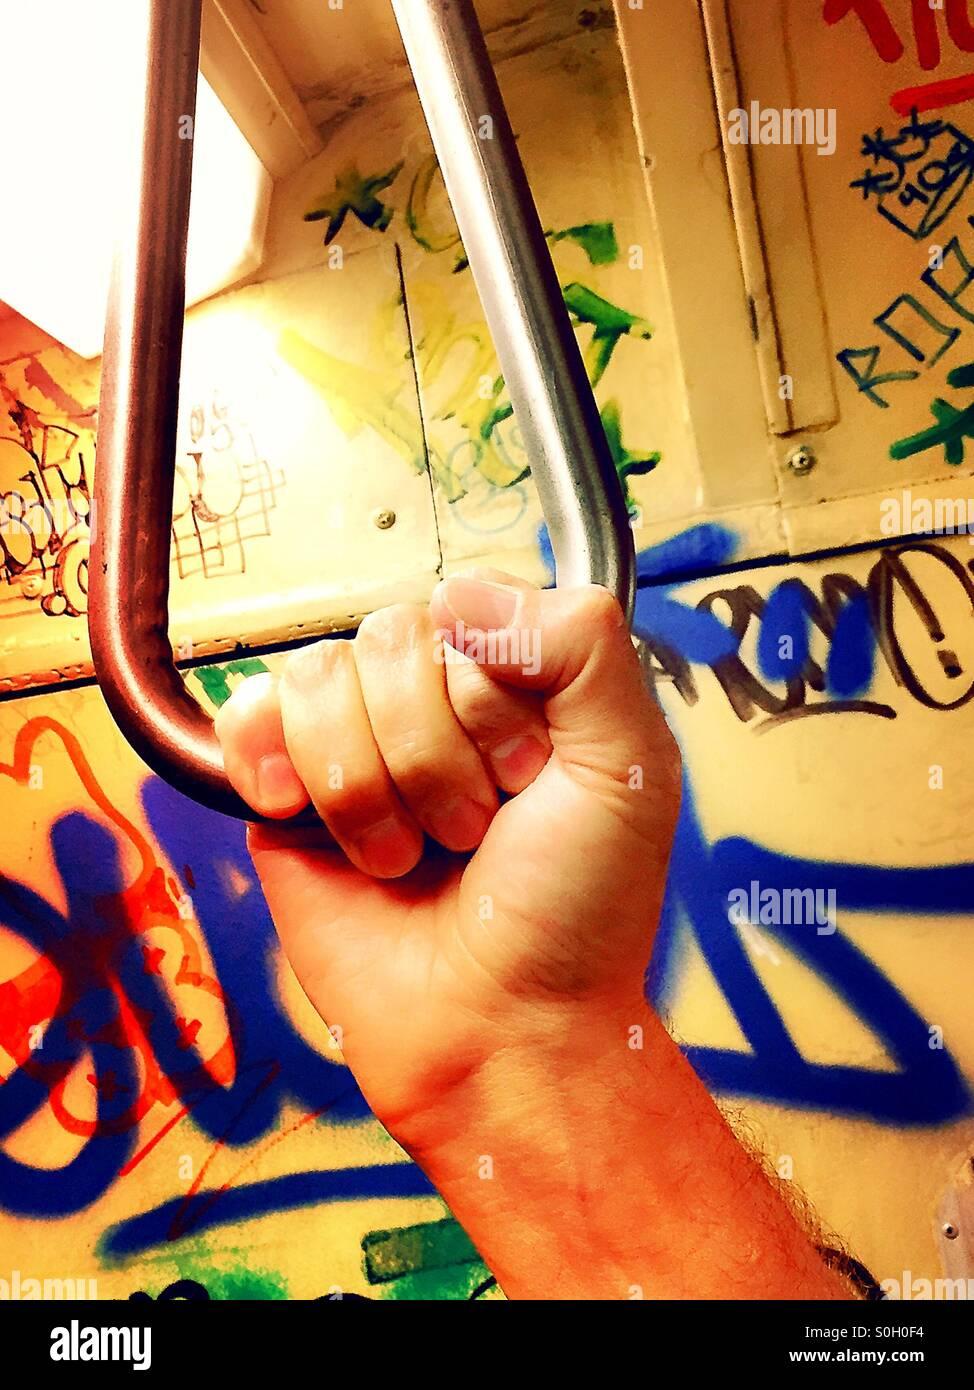 Man's hand holding pivoted grab handle on vintage New York City subway - Stock Image